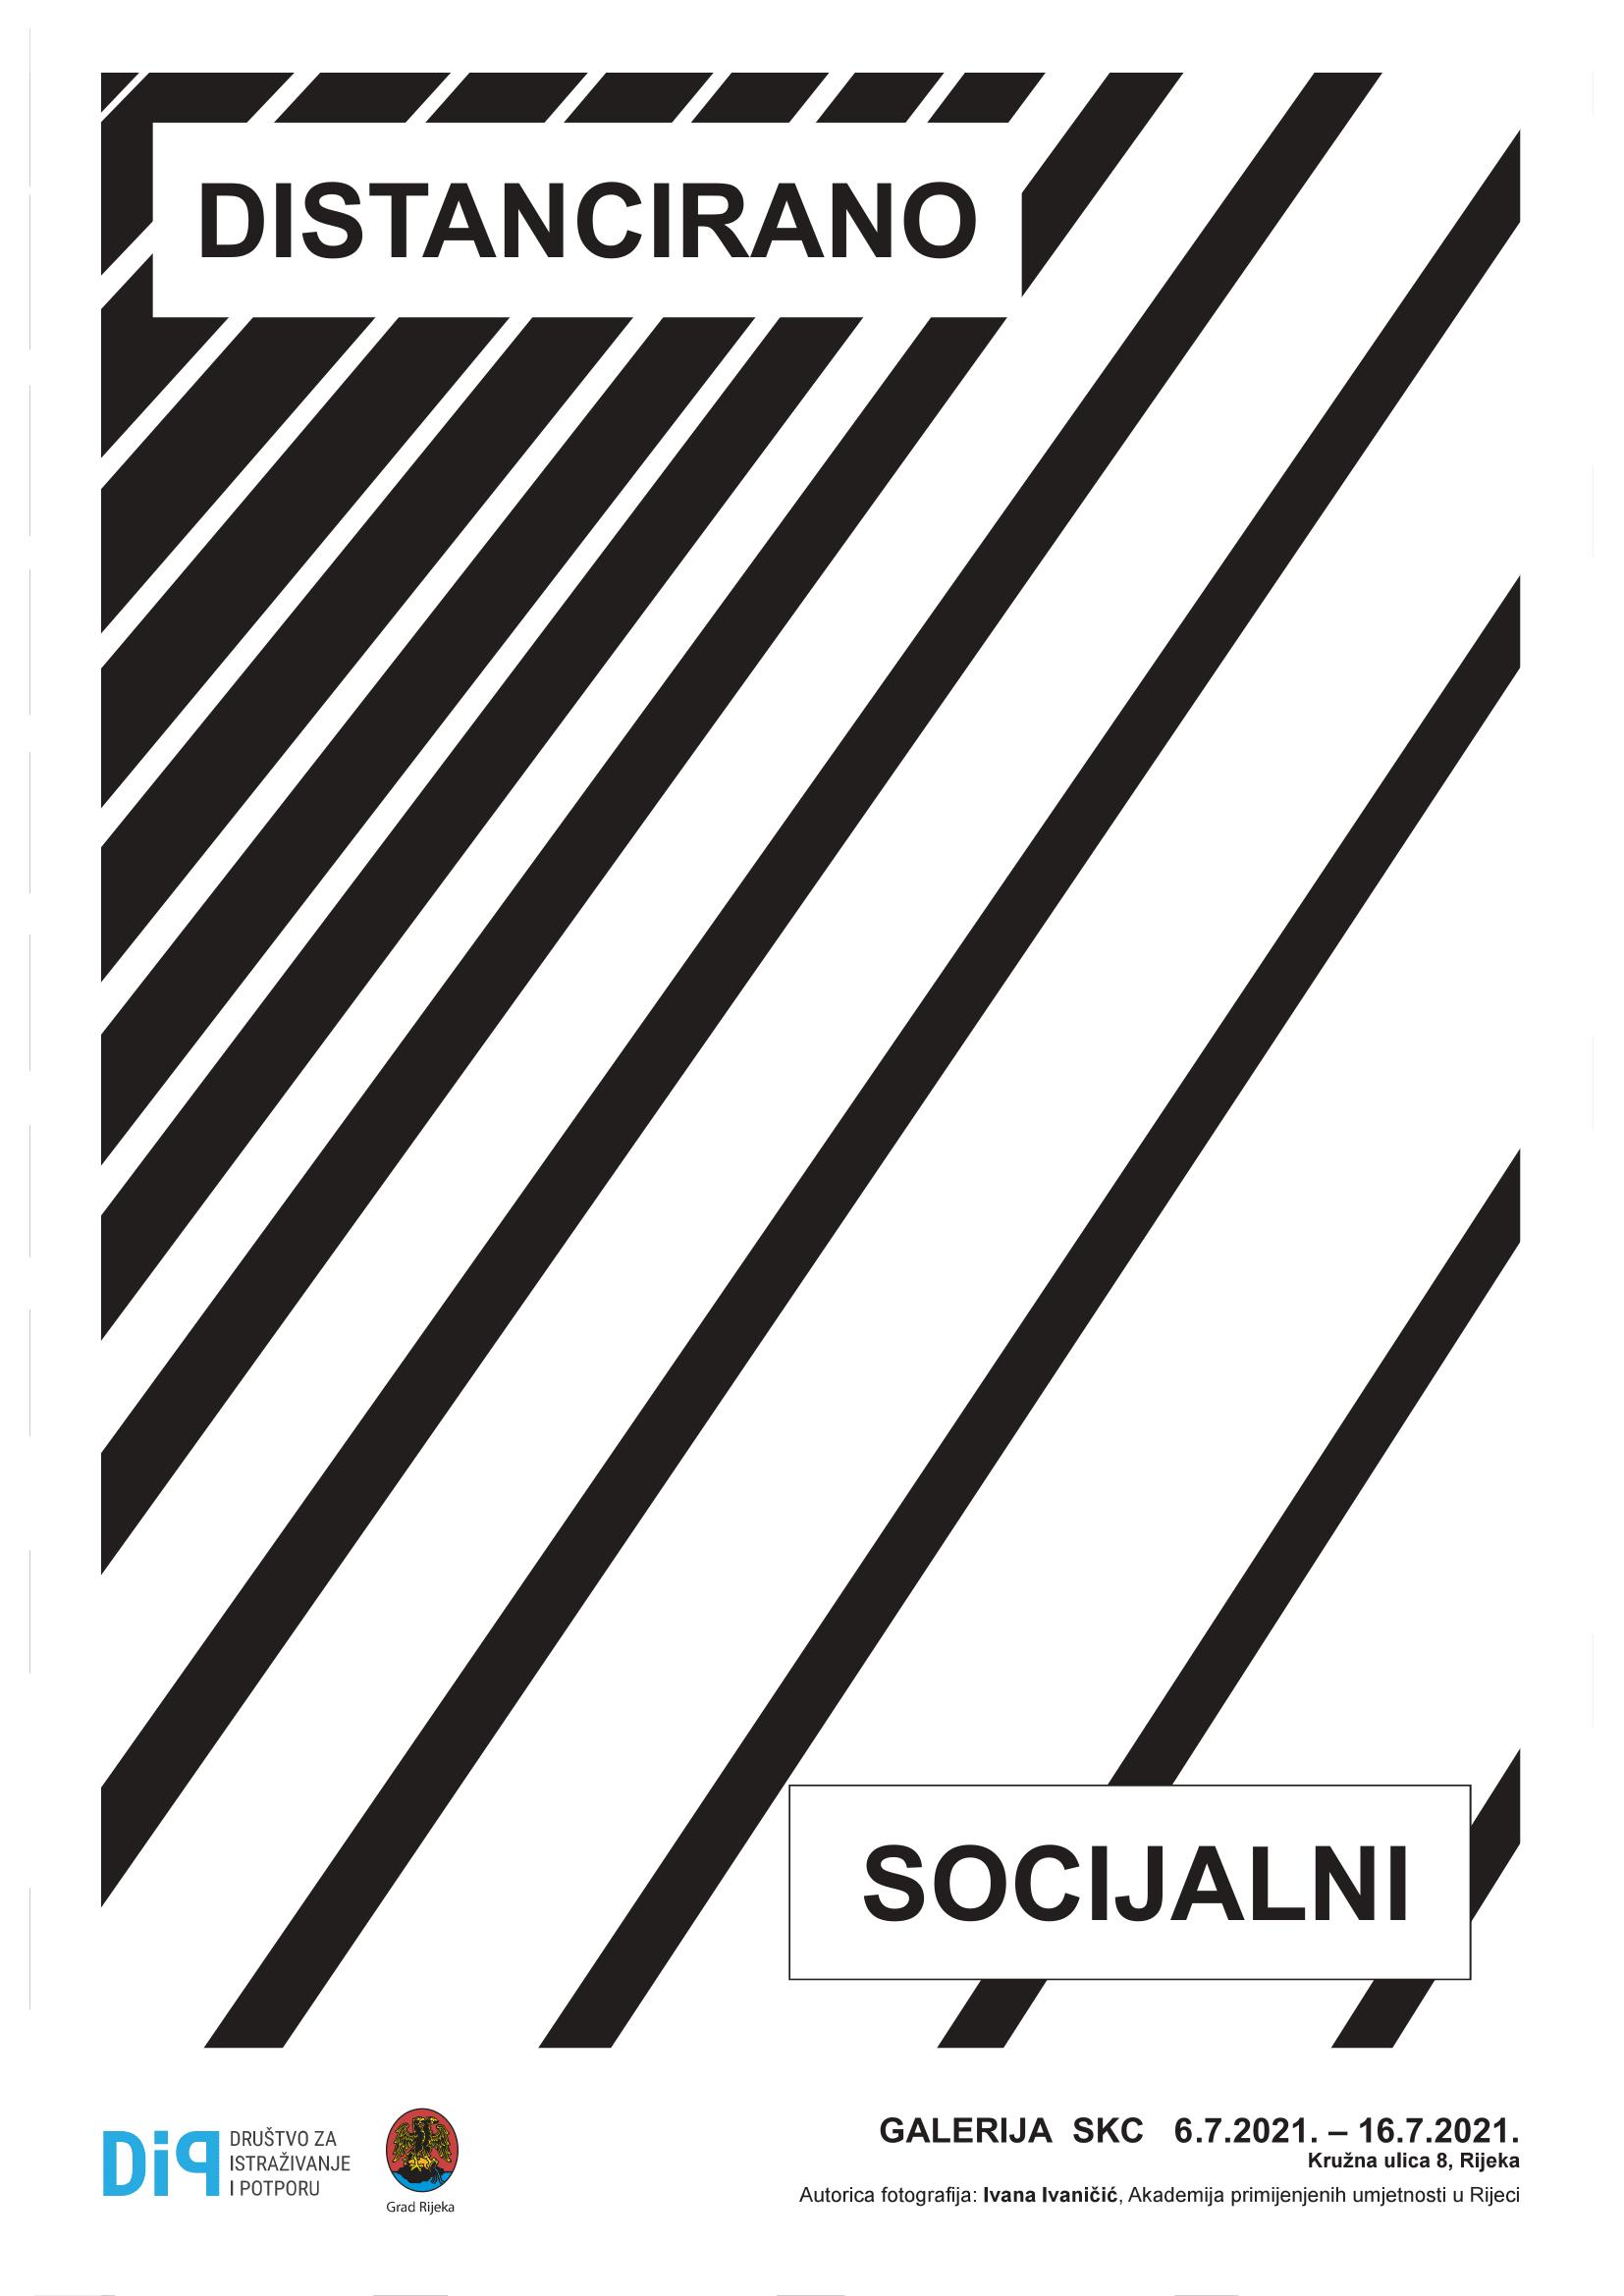 Plakat izložbe Distancirano socijalni